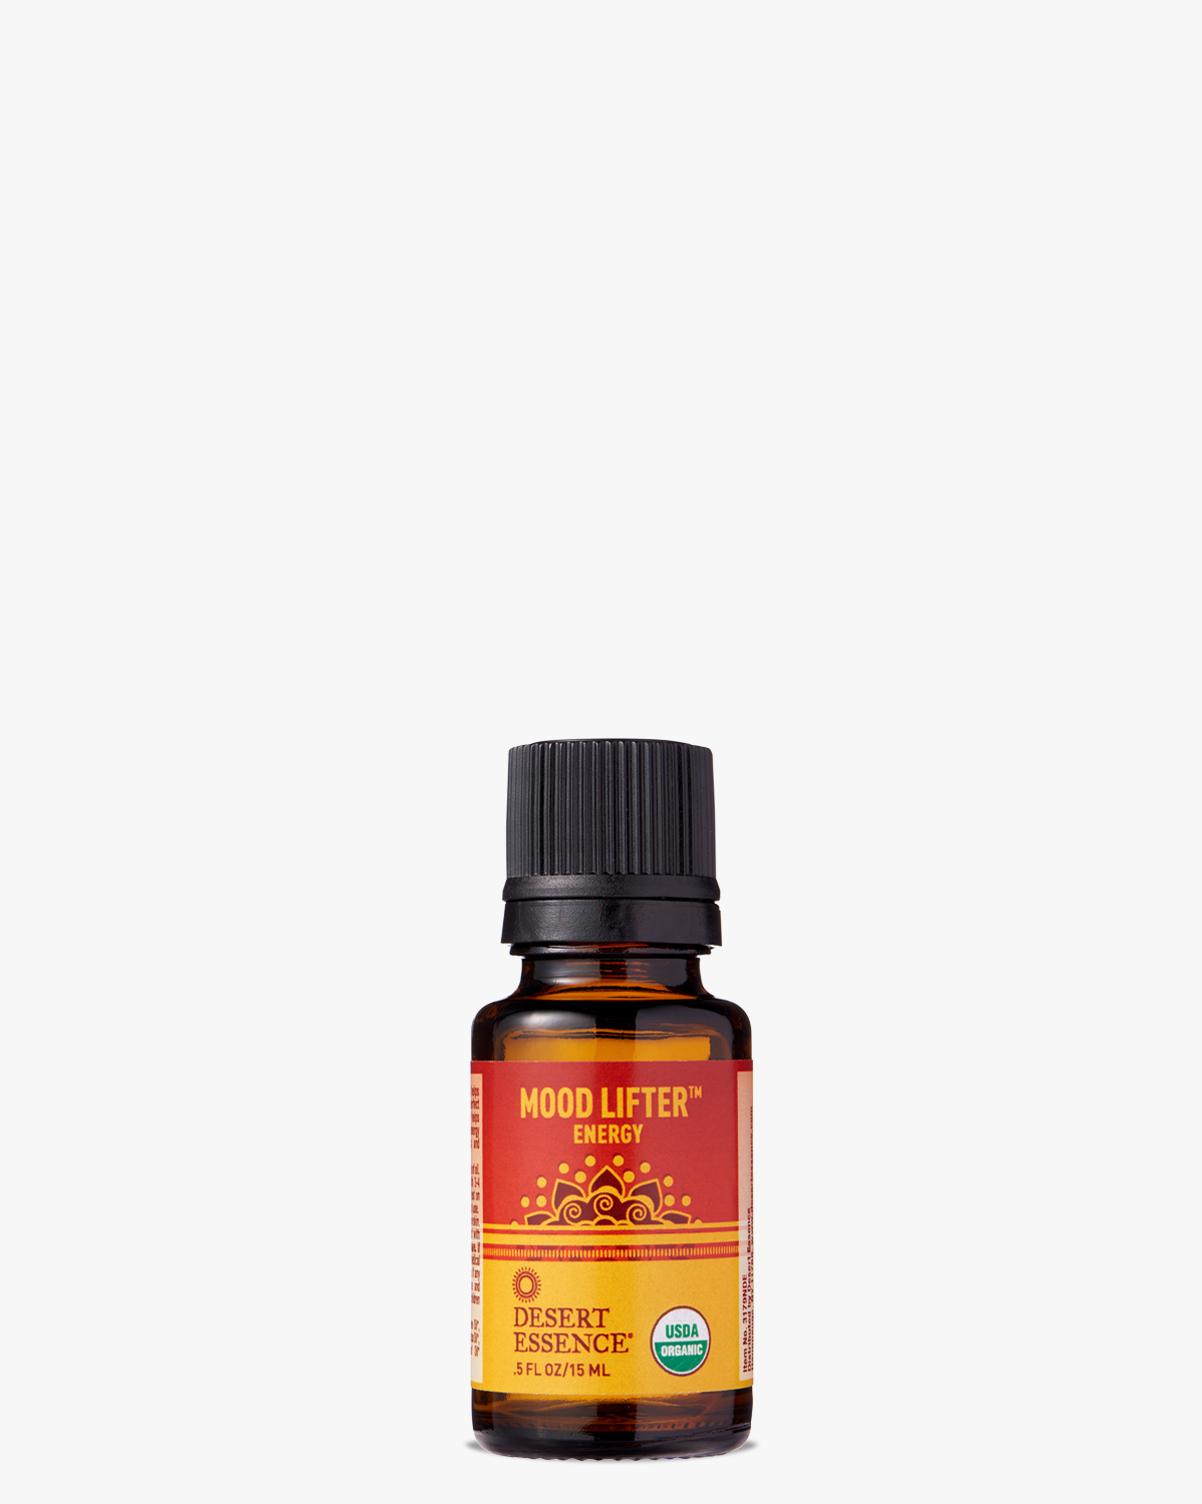 Desert Essence coupon: Desert Essence Mood Lifter Organic Essential Oil, 0.5 fl. oz. | Vegan | Gluten-Free